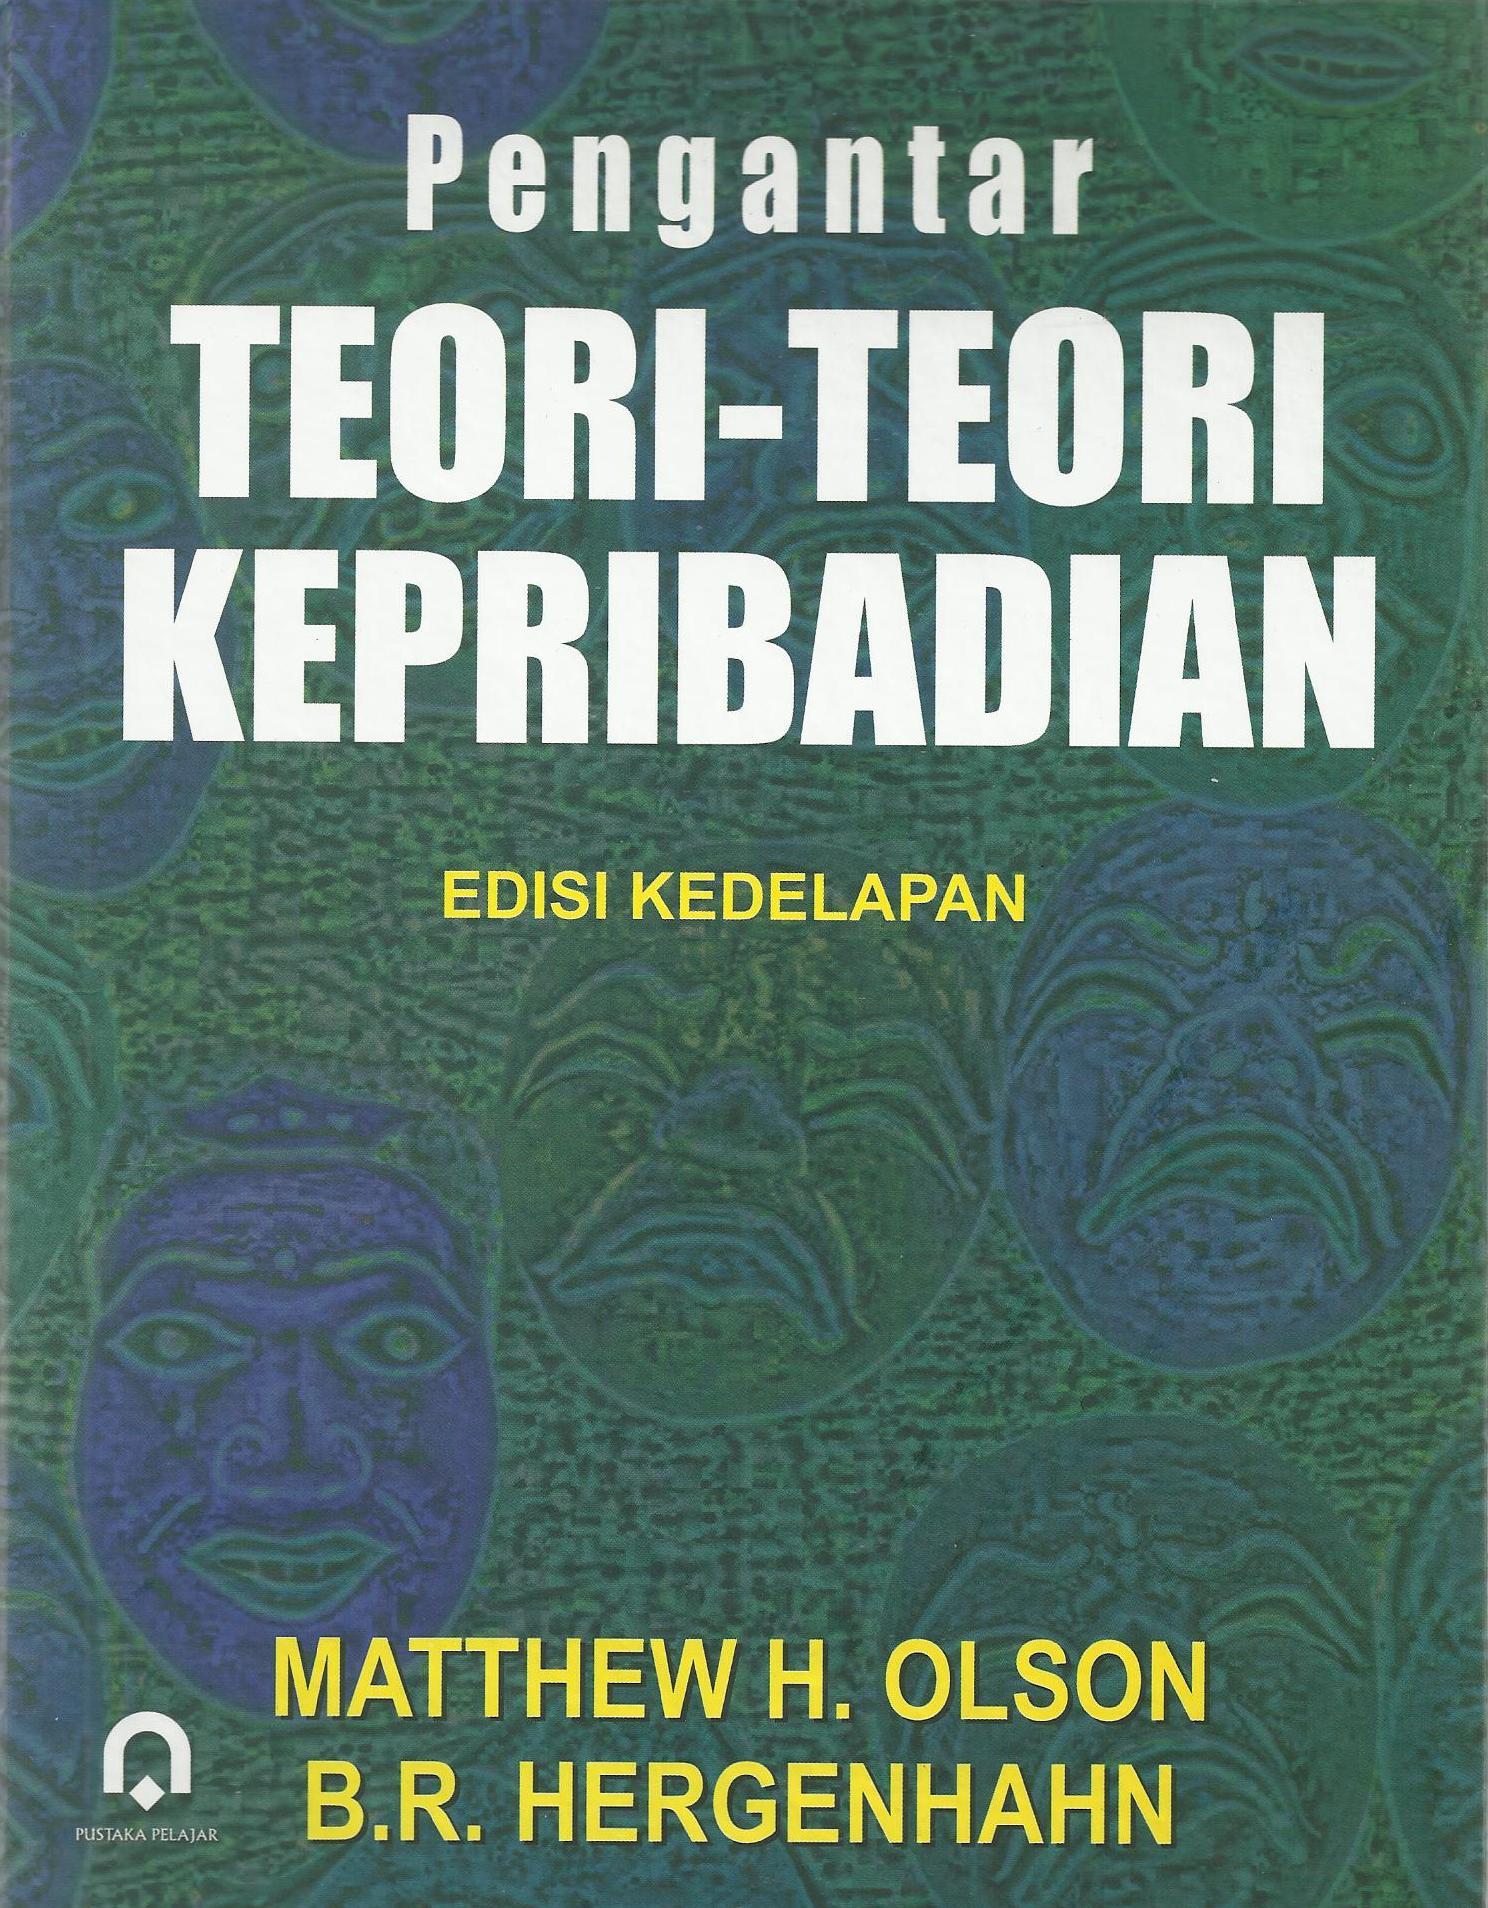 PENGANTAR TEORI-TEORI KEPRIBADIAN